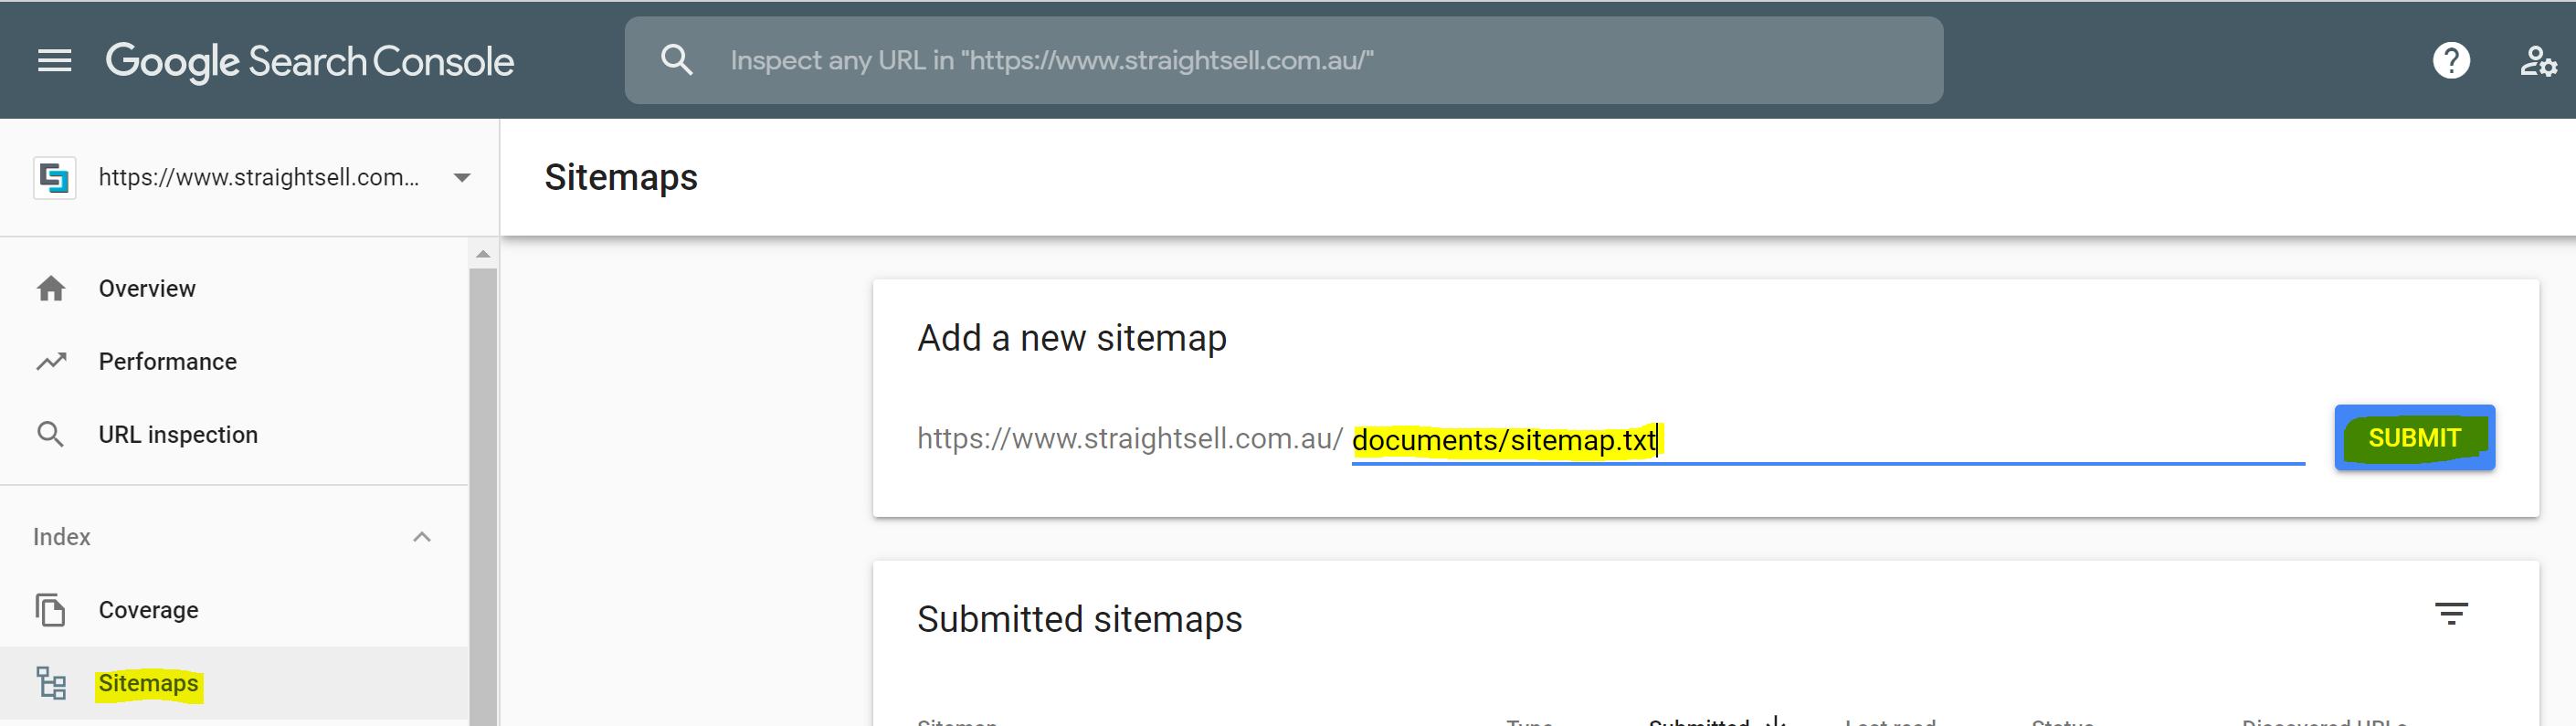 Google Sitemap Image